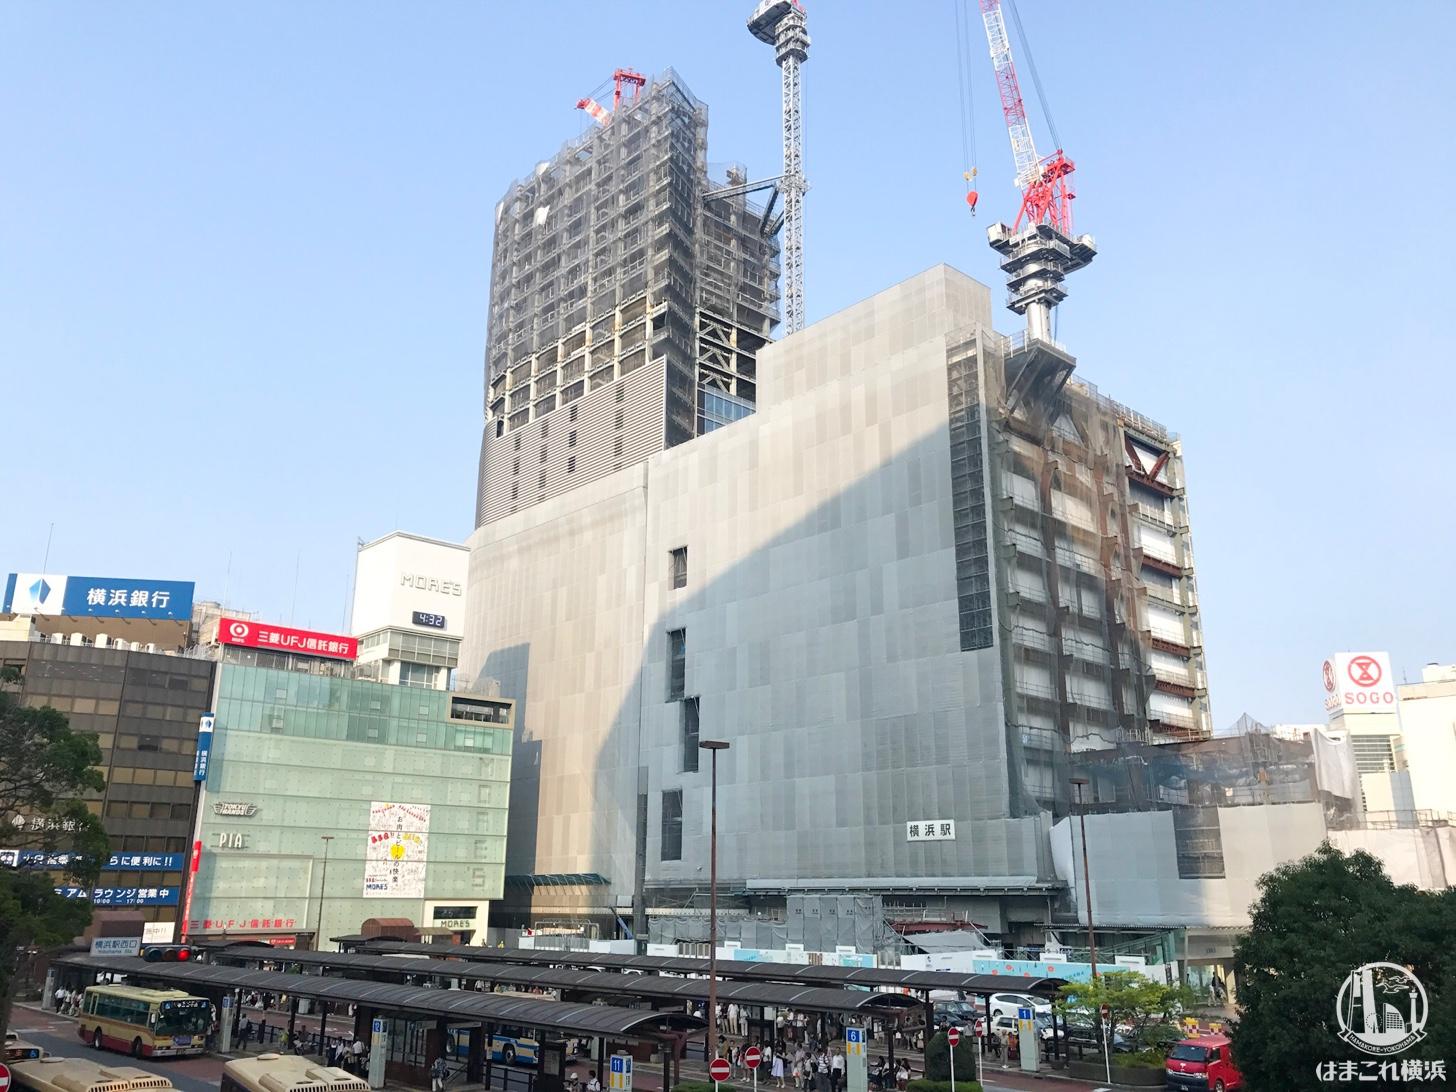 2018年7月 横浜駅西口の様子